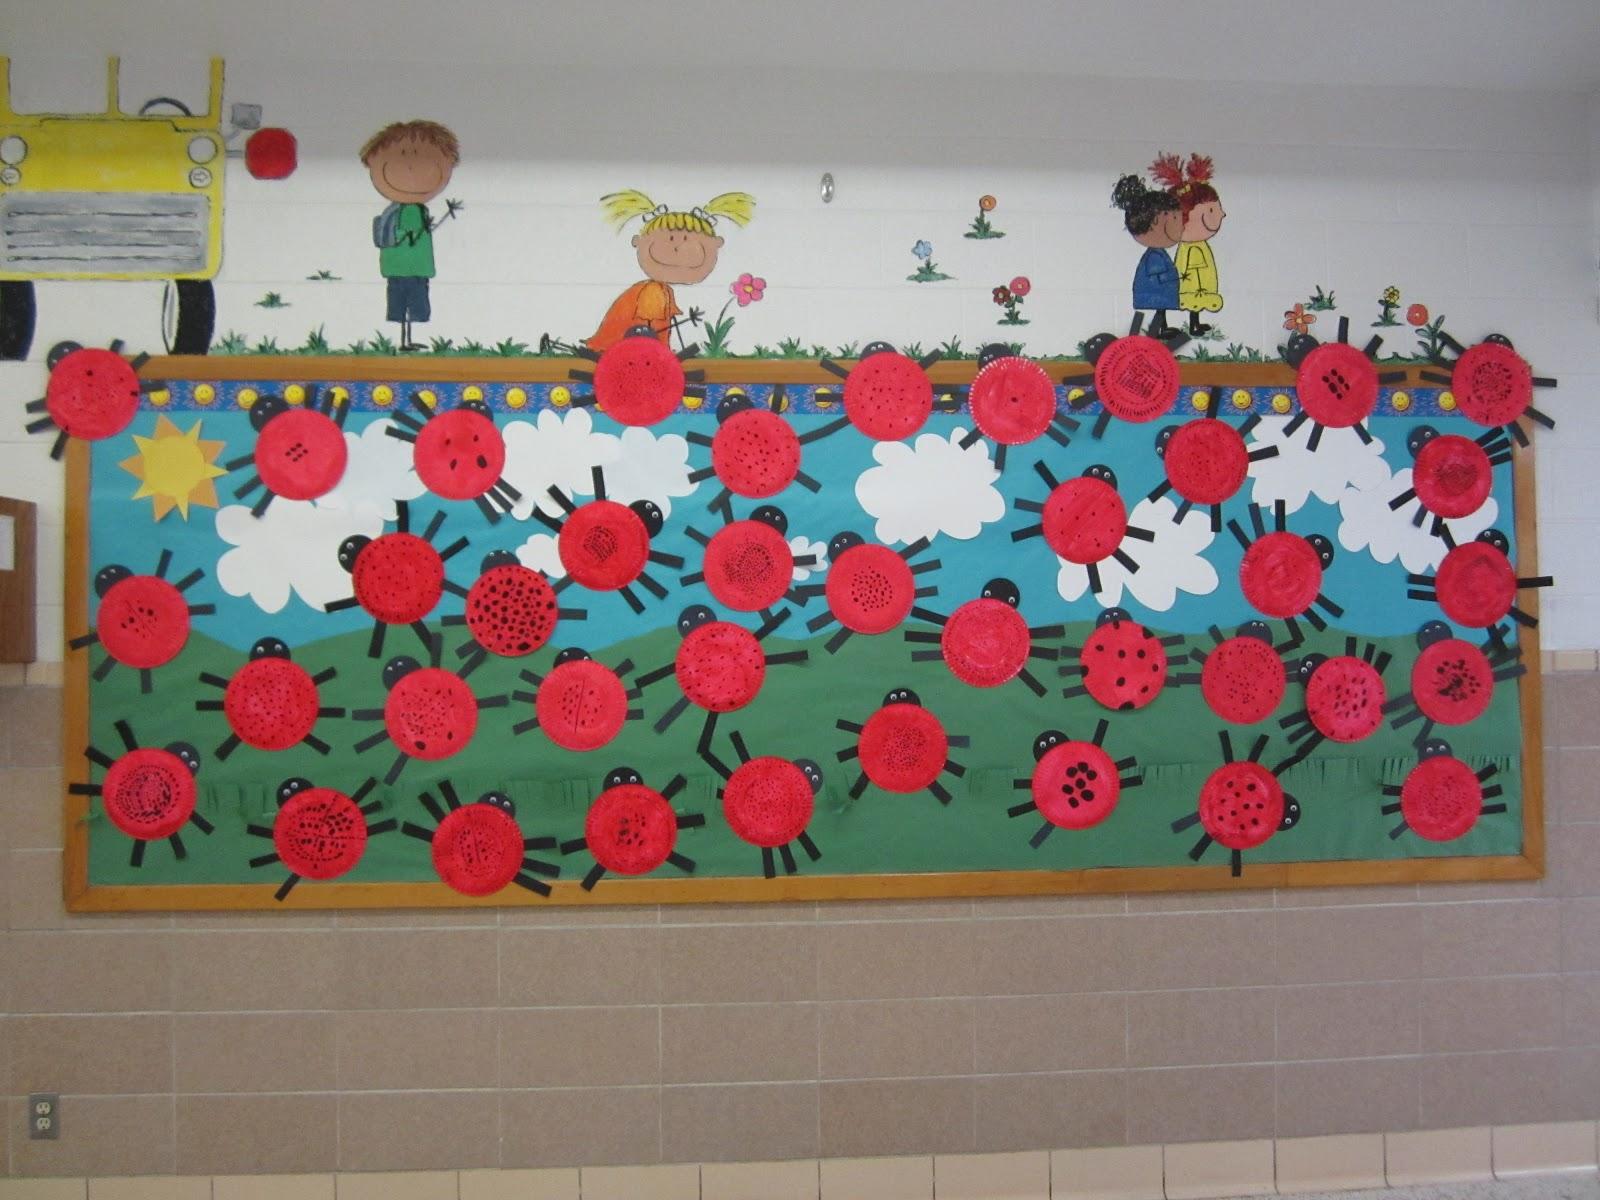 Ladybug Classroom Decoration Ideas : Teaching little miracles ladybugs ladybugs cute bulletin board